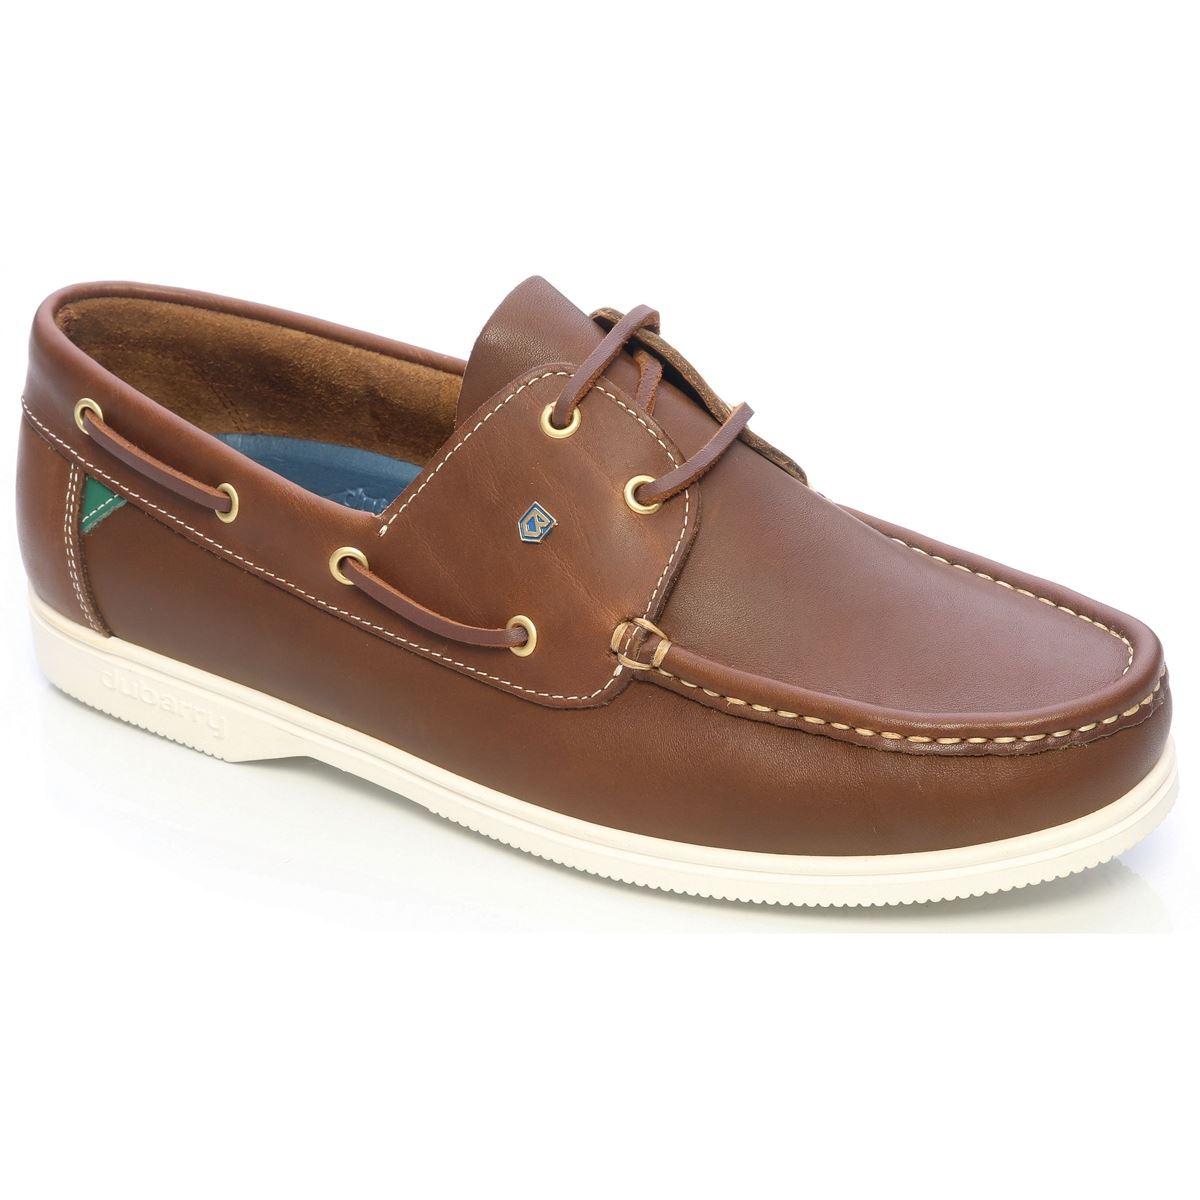 Dubarry Unisex Admirals Deck Shoe Brown 6.5 (EU40)